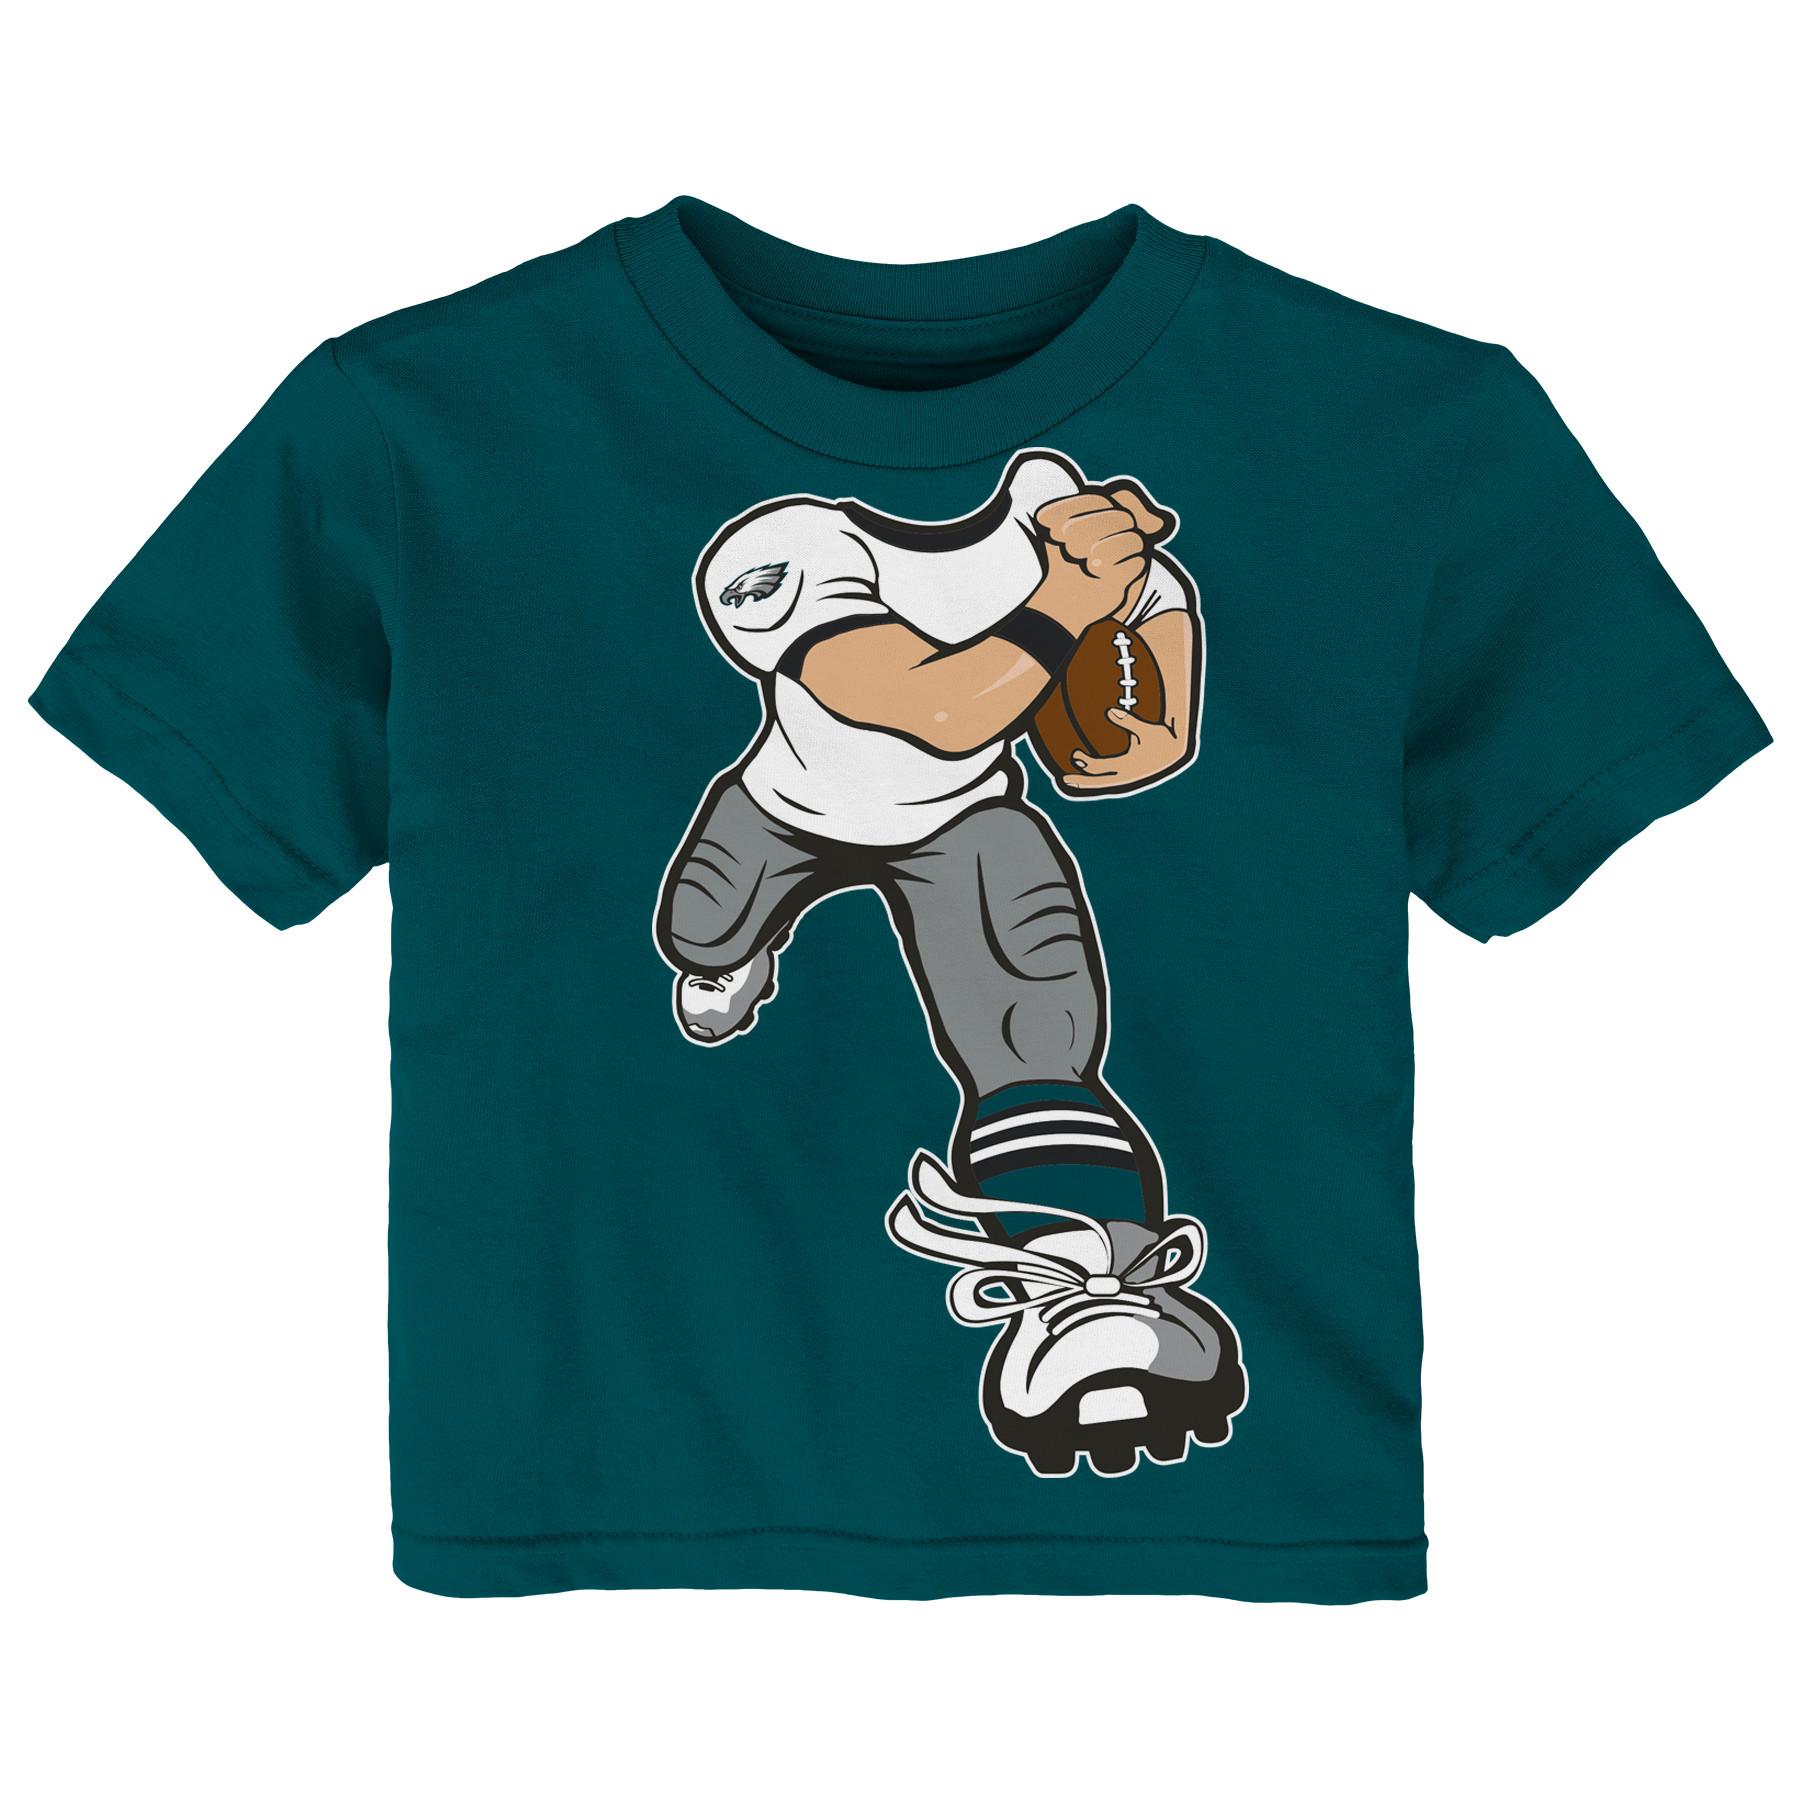 Philadelphia Eagles Toddler Yard Rush T-Shirt - Midnight Green